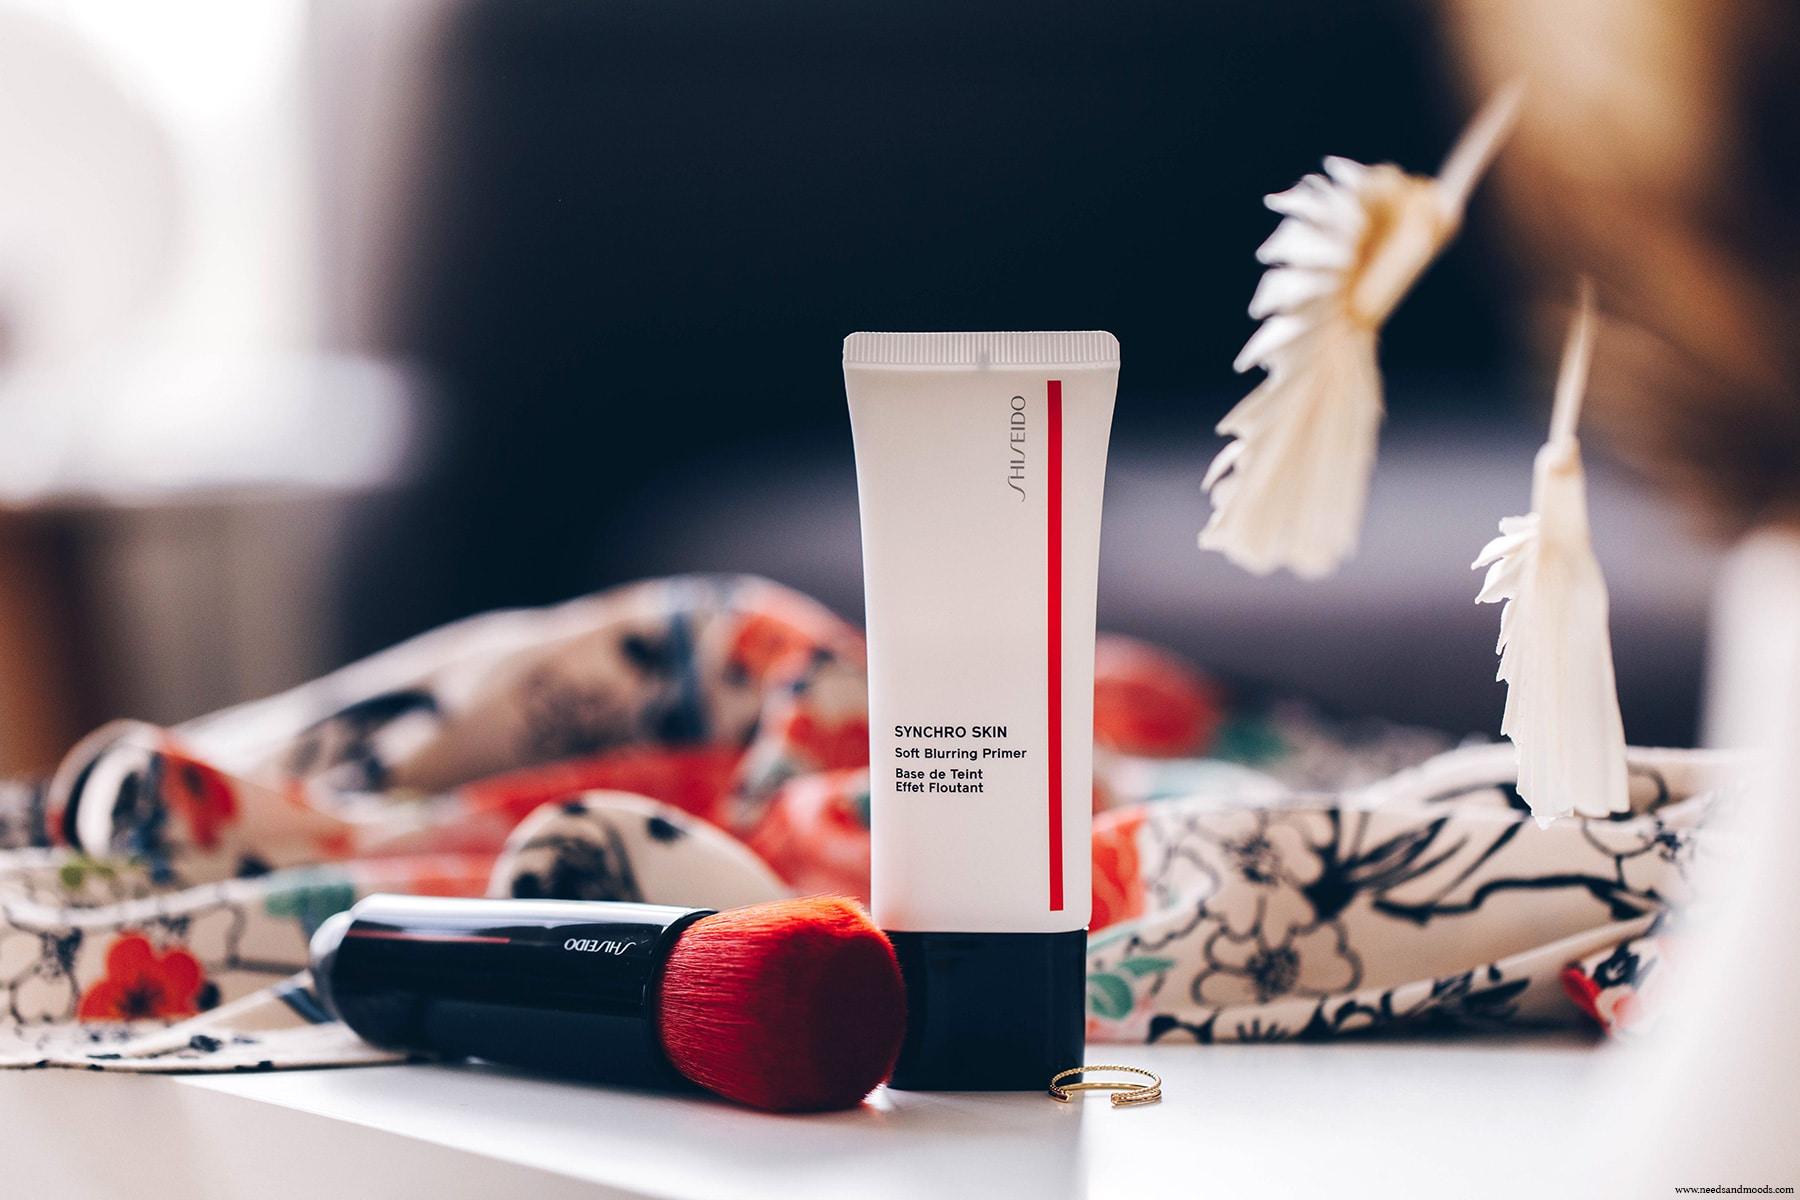 shiseido synchro skin base teint effet floutant avis